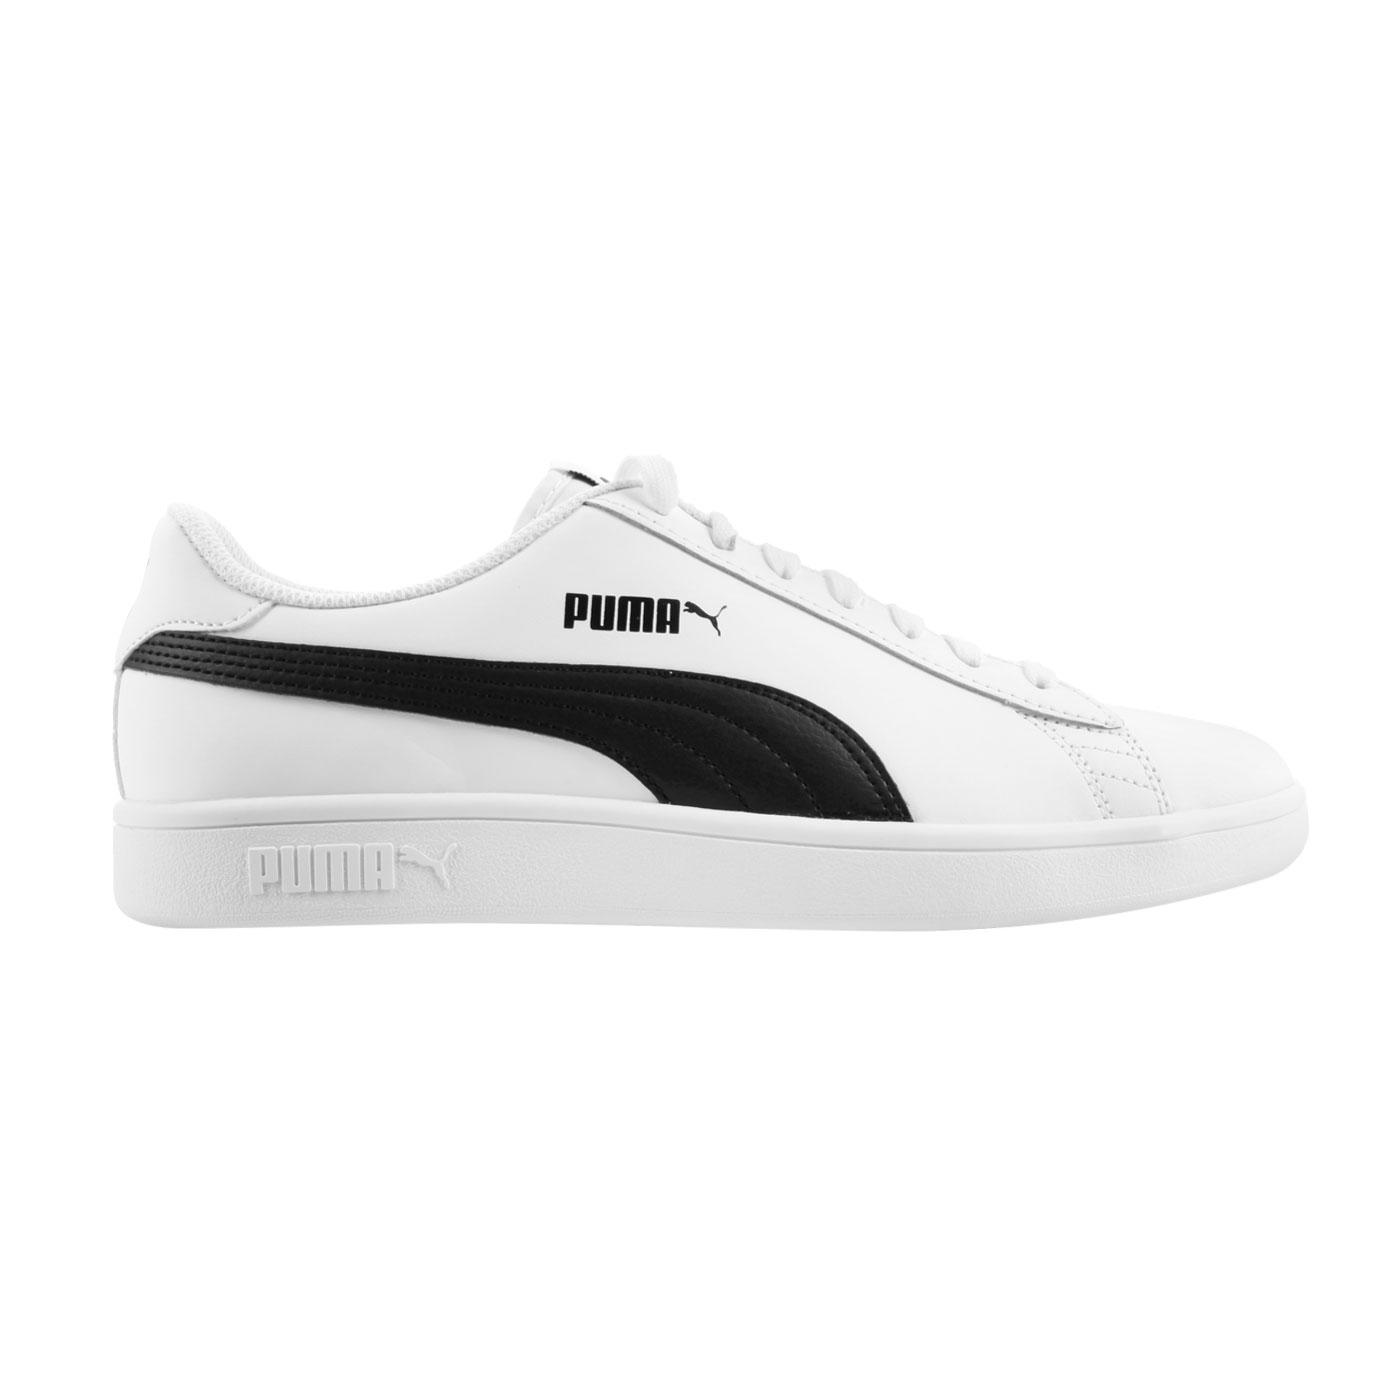 PUMA 男款休閒運動鞋  @Smash v2 L@36521501 - 白黑